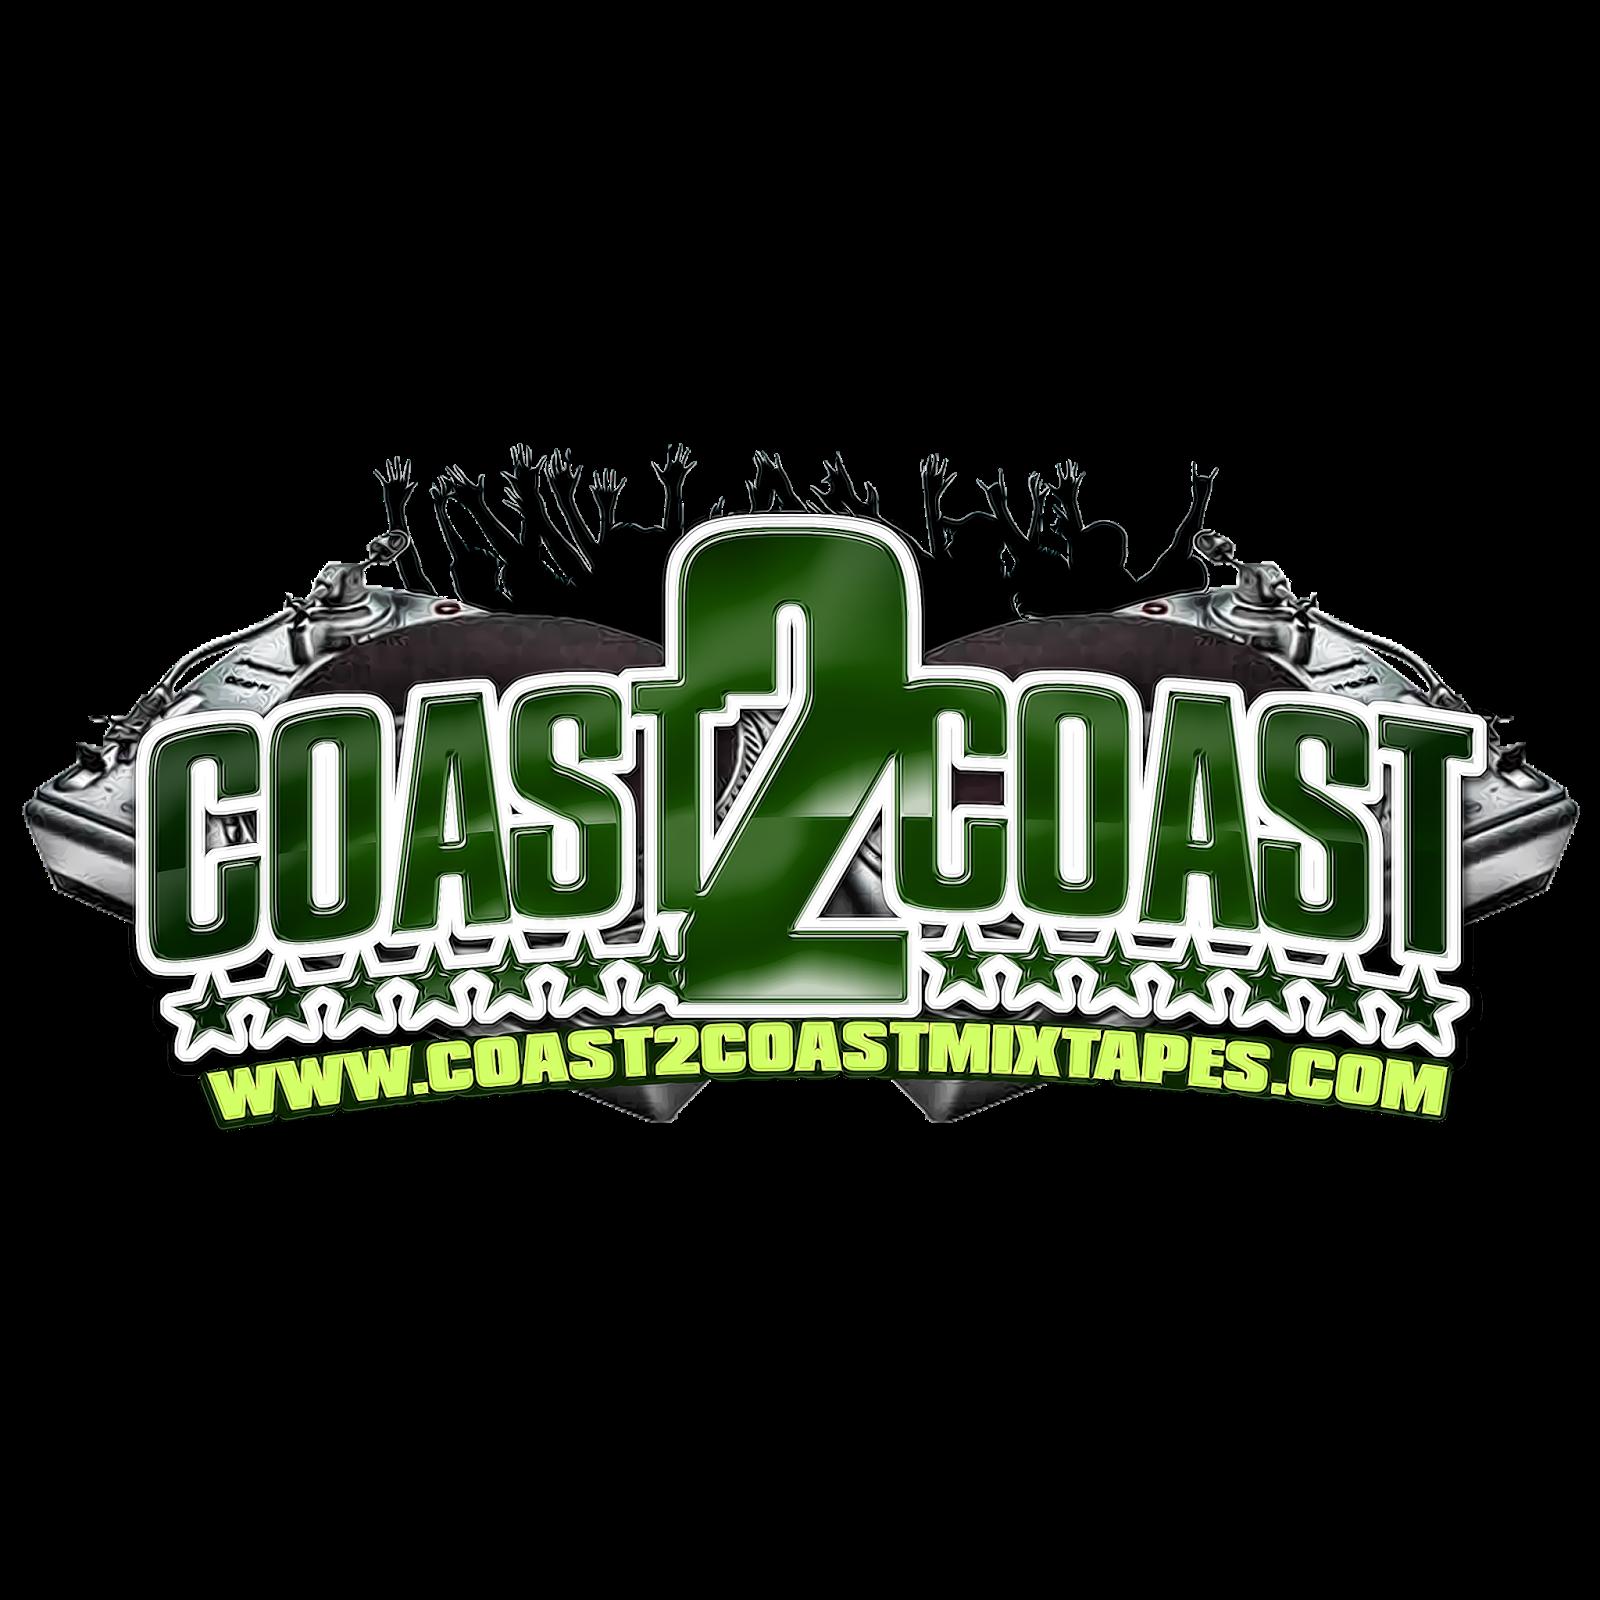 http://coast2coastmixtapes.com